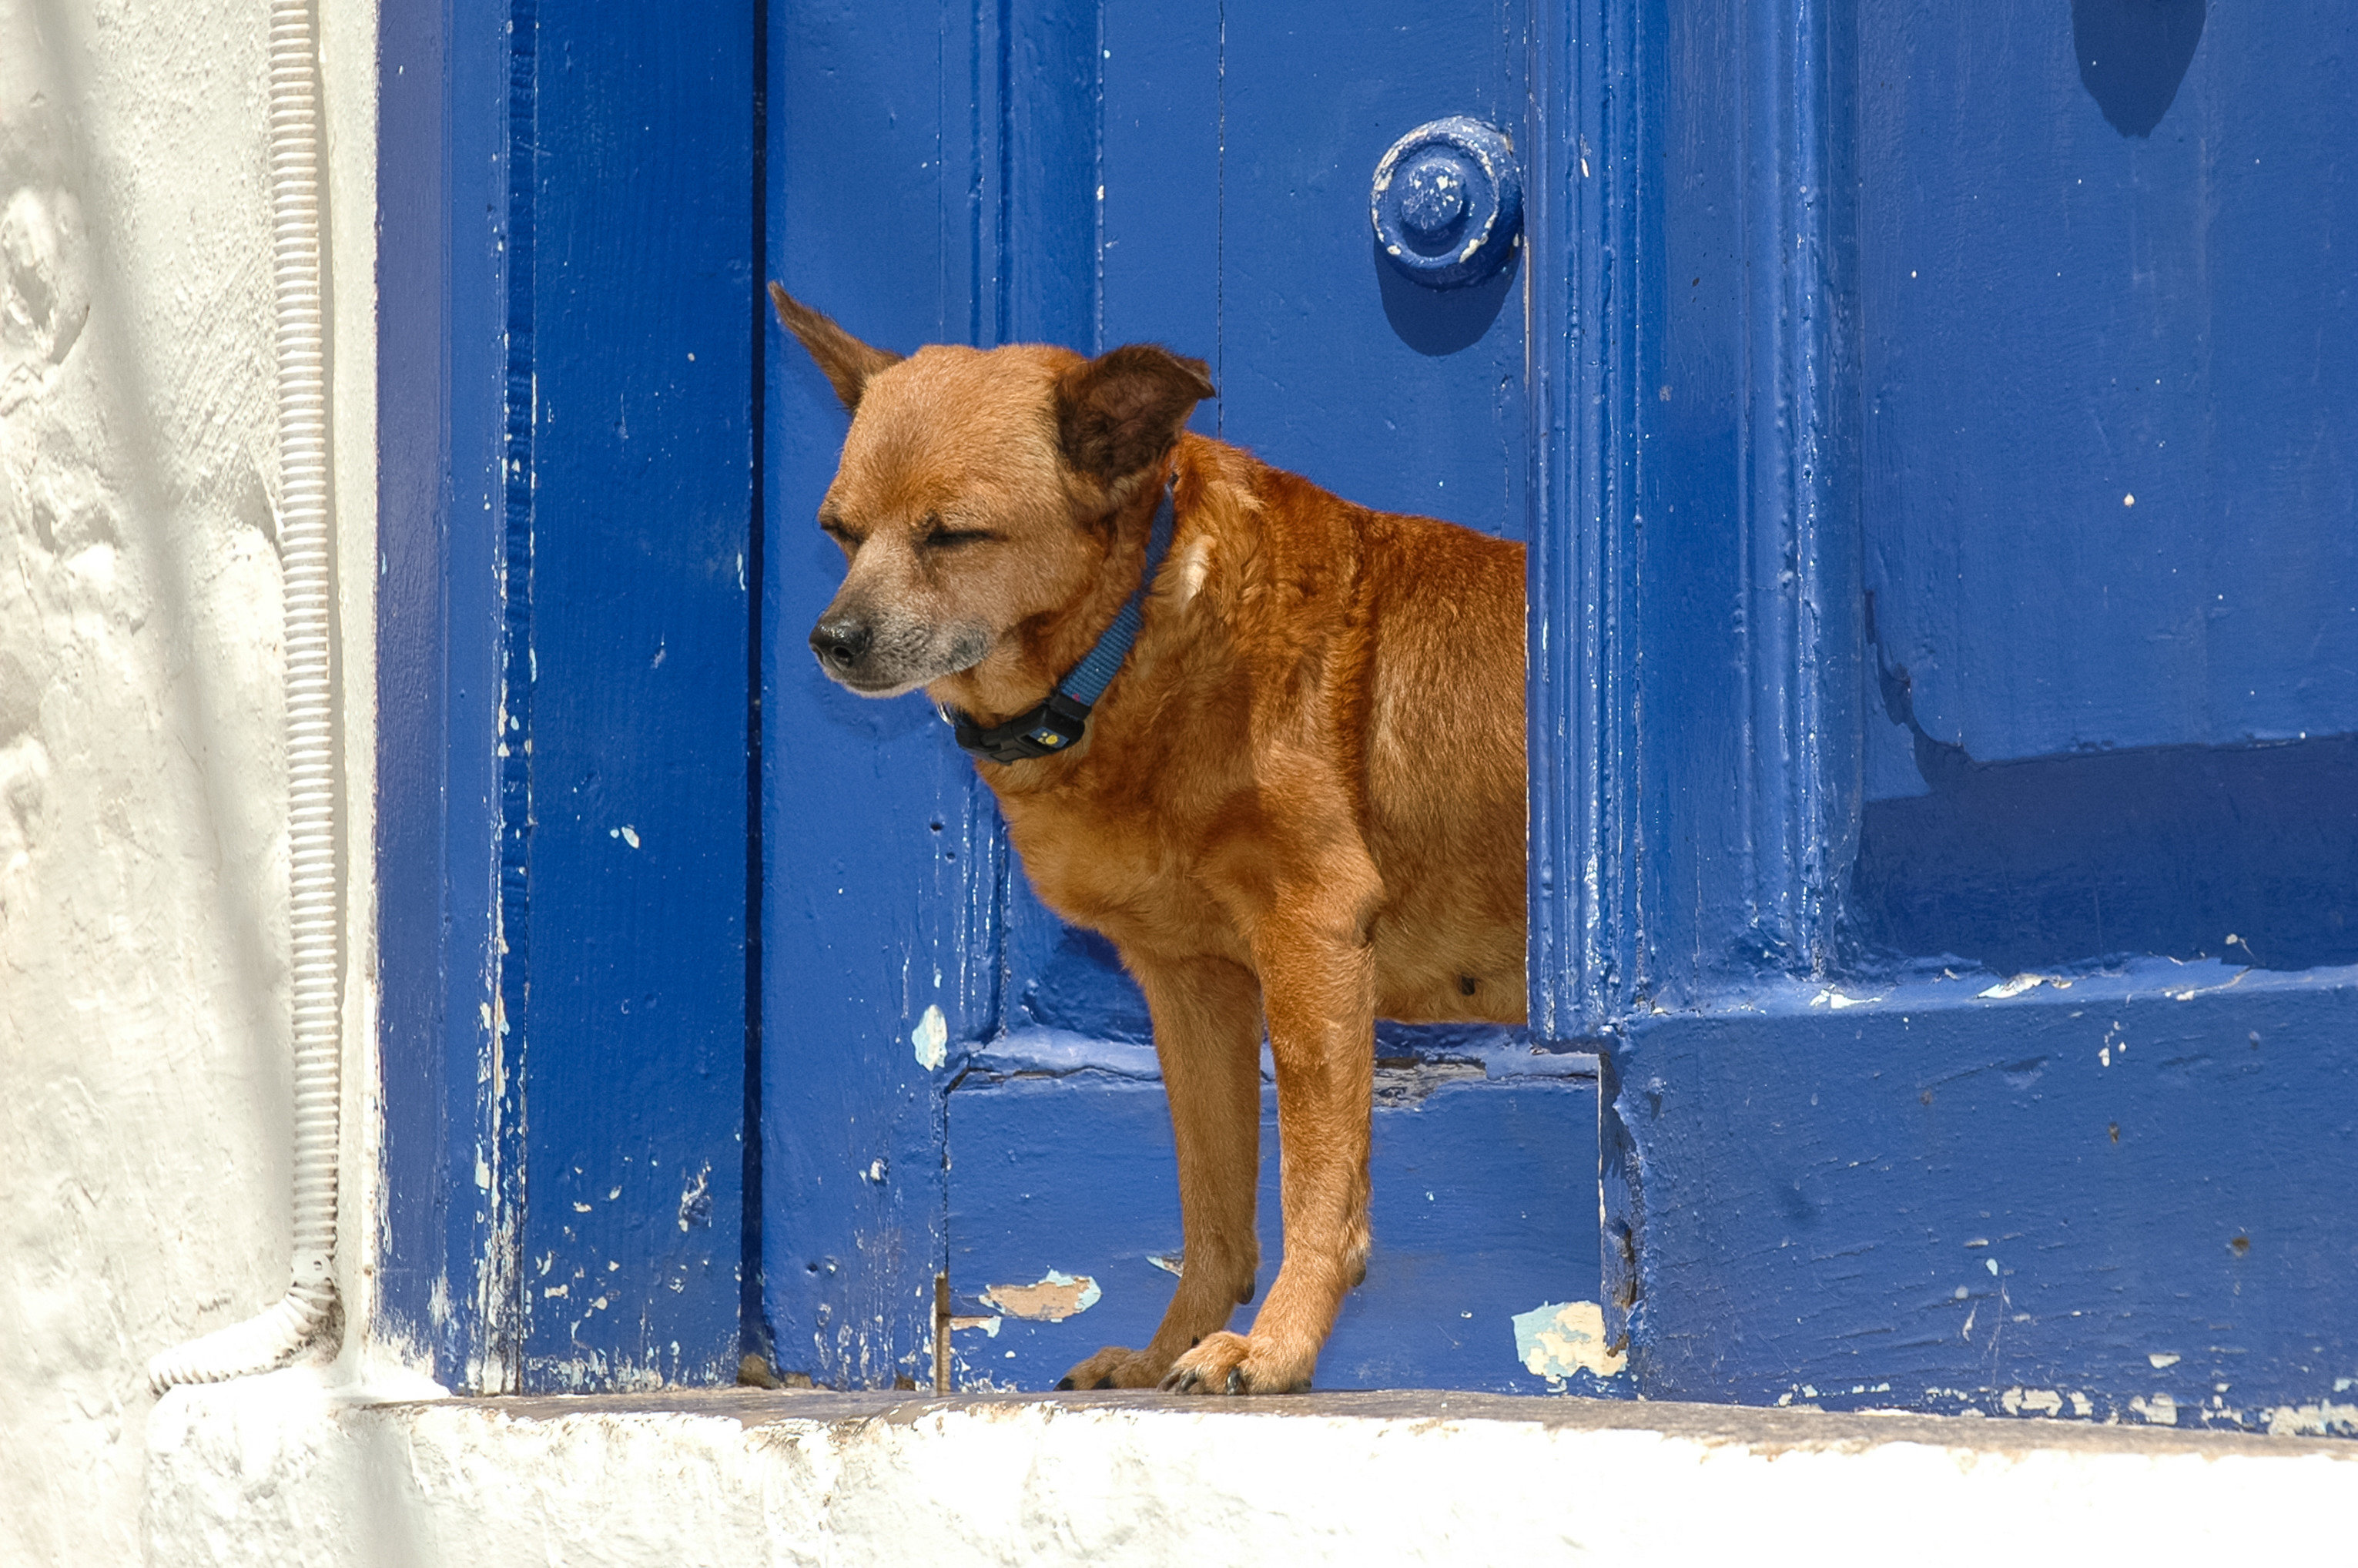 Offbeat Trip Ideas Dog building blue brown outdoor mammal dog breed group snow street dog door Winter black puppy dog like mammal animal shelter doorway staring